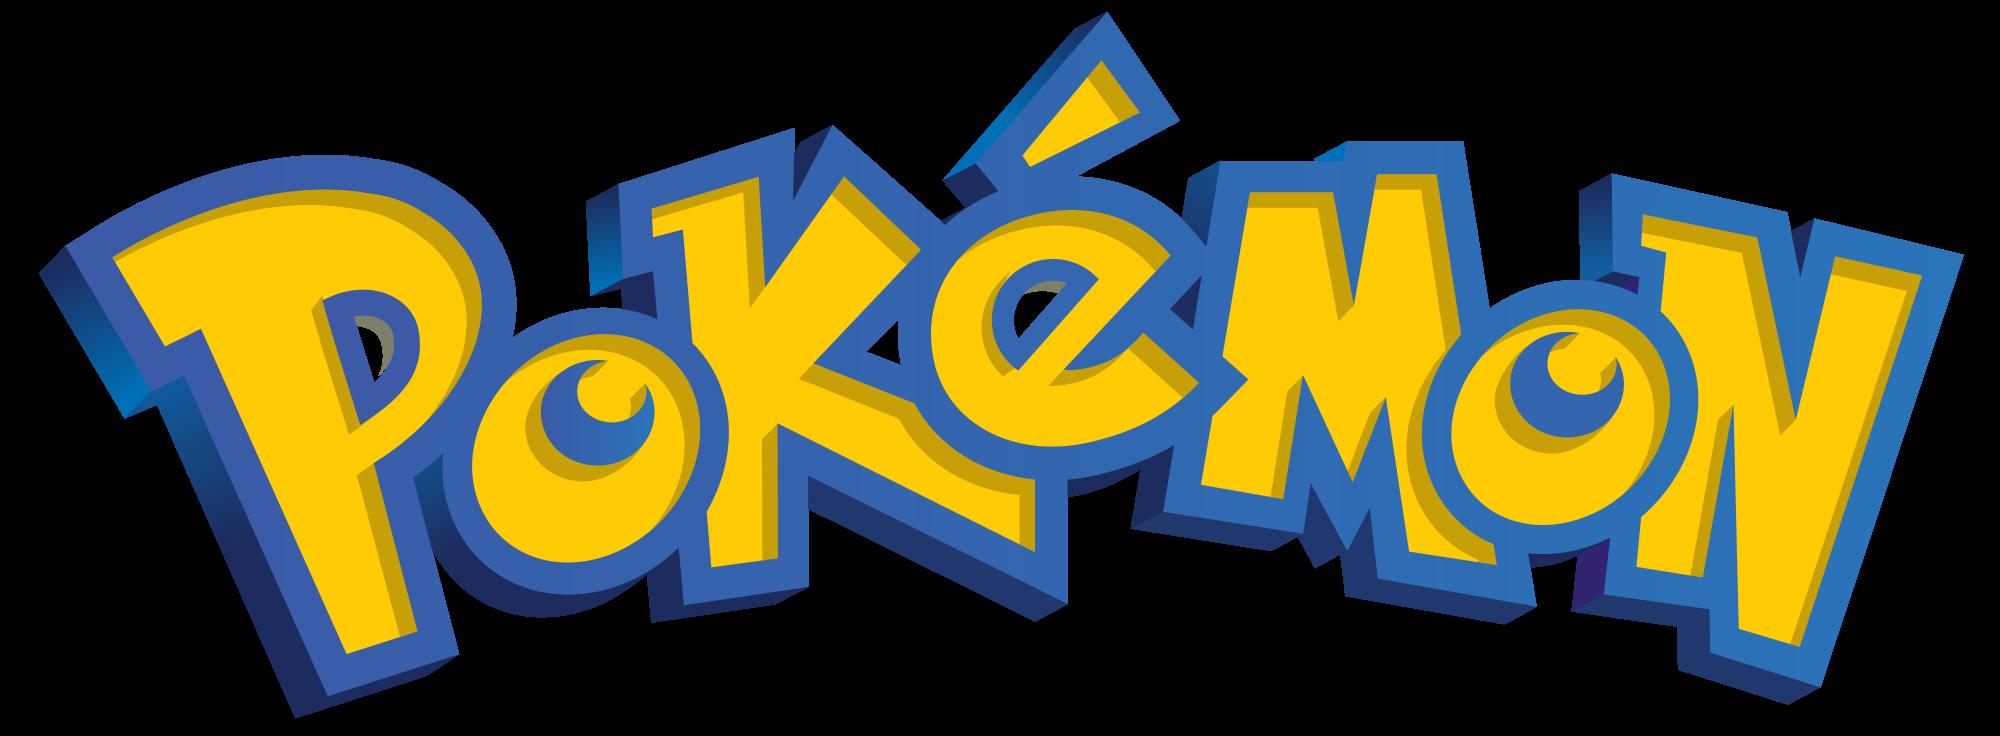 Png pic . Pokeball clipart logo pokemon